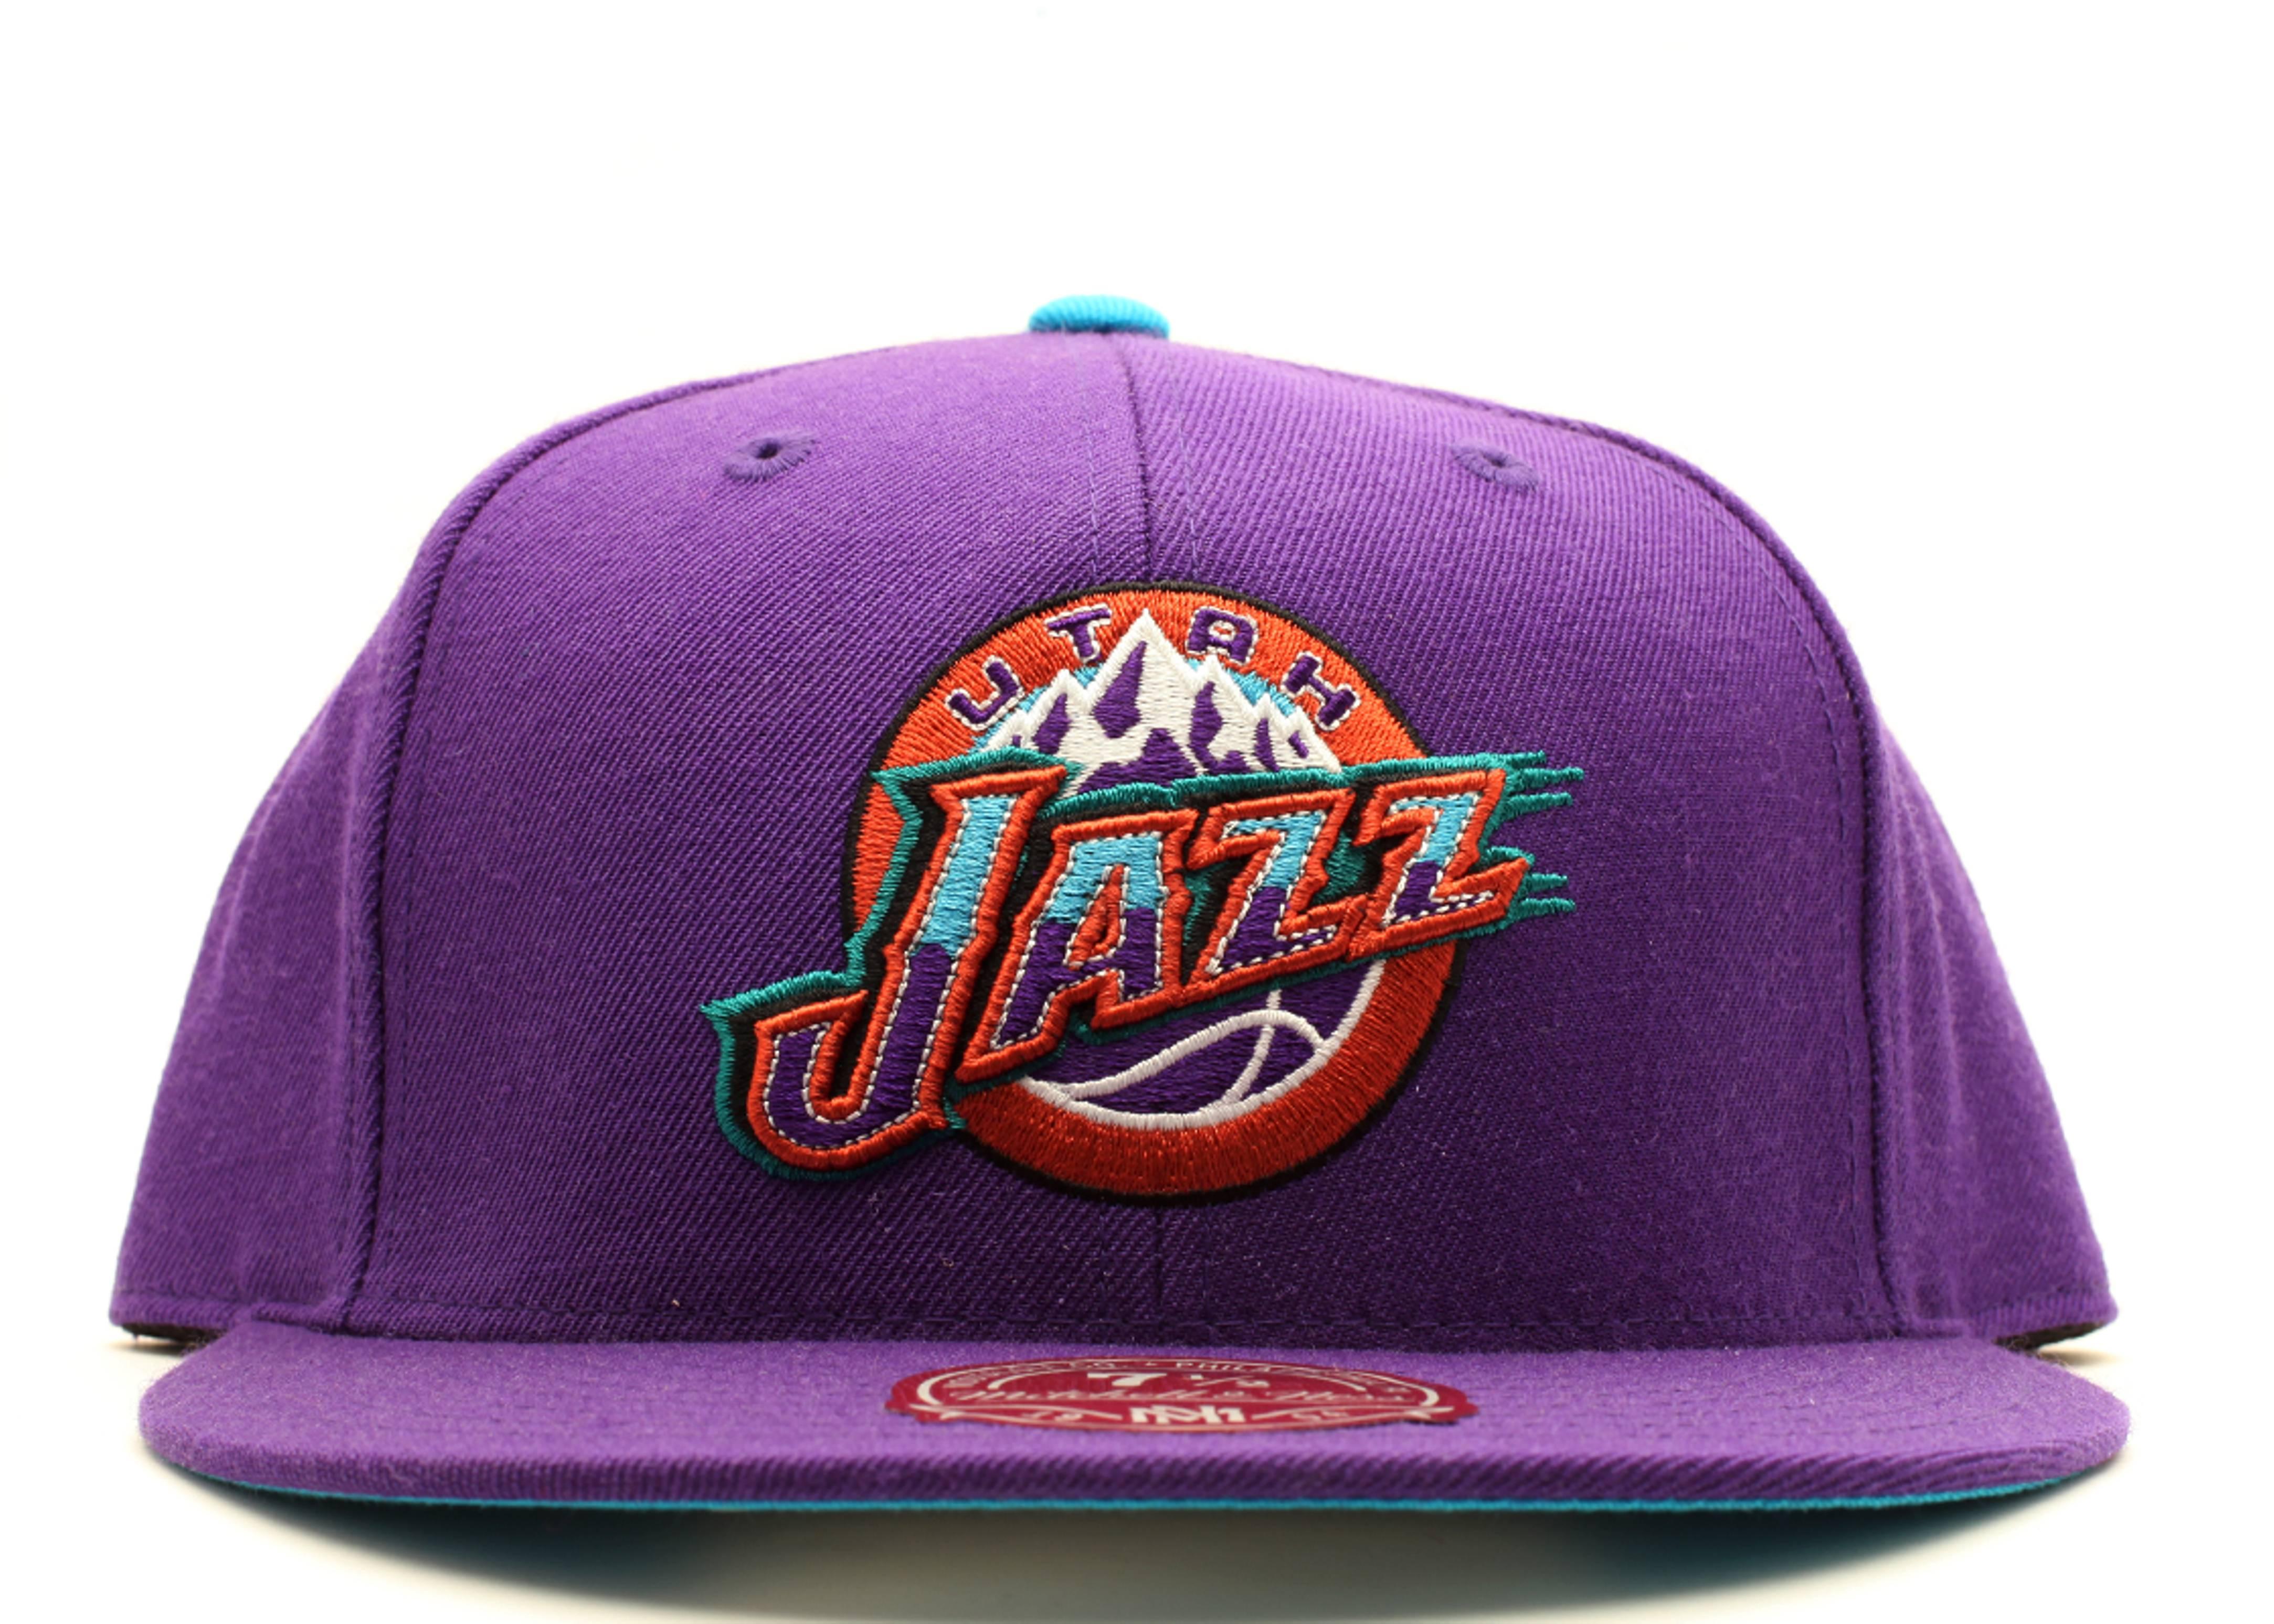 competitive price 897be 0ec81 Utah Jazz Fitted - Mitchell & Ness - tk41tpc5jazz - purple ...